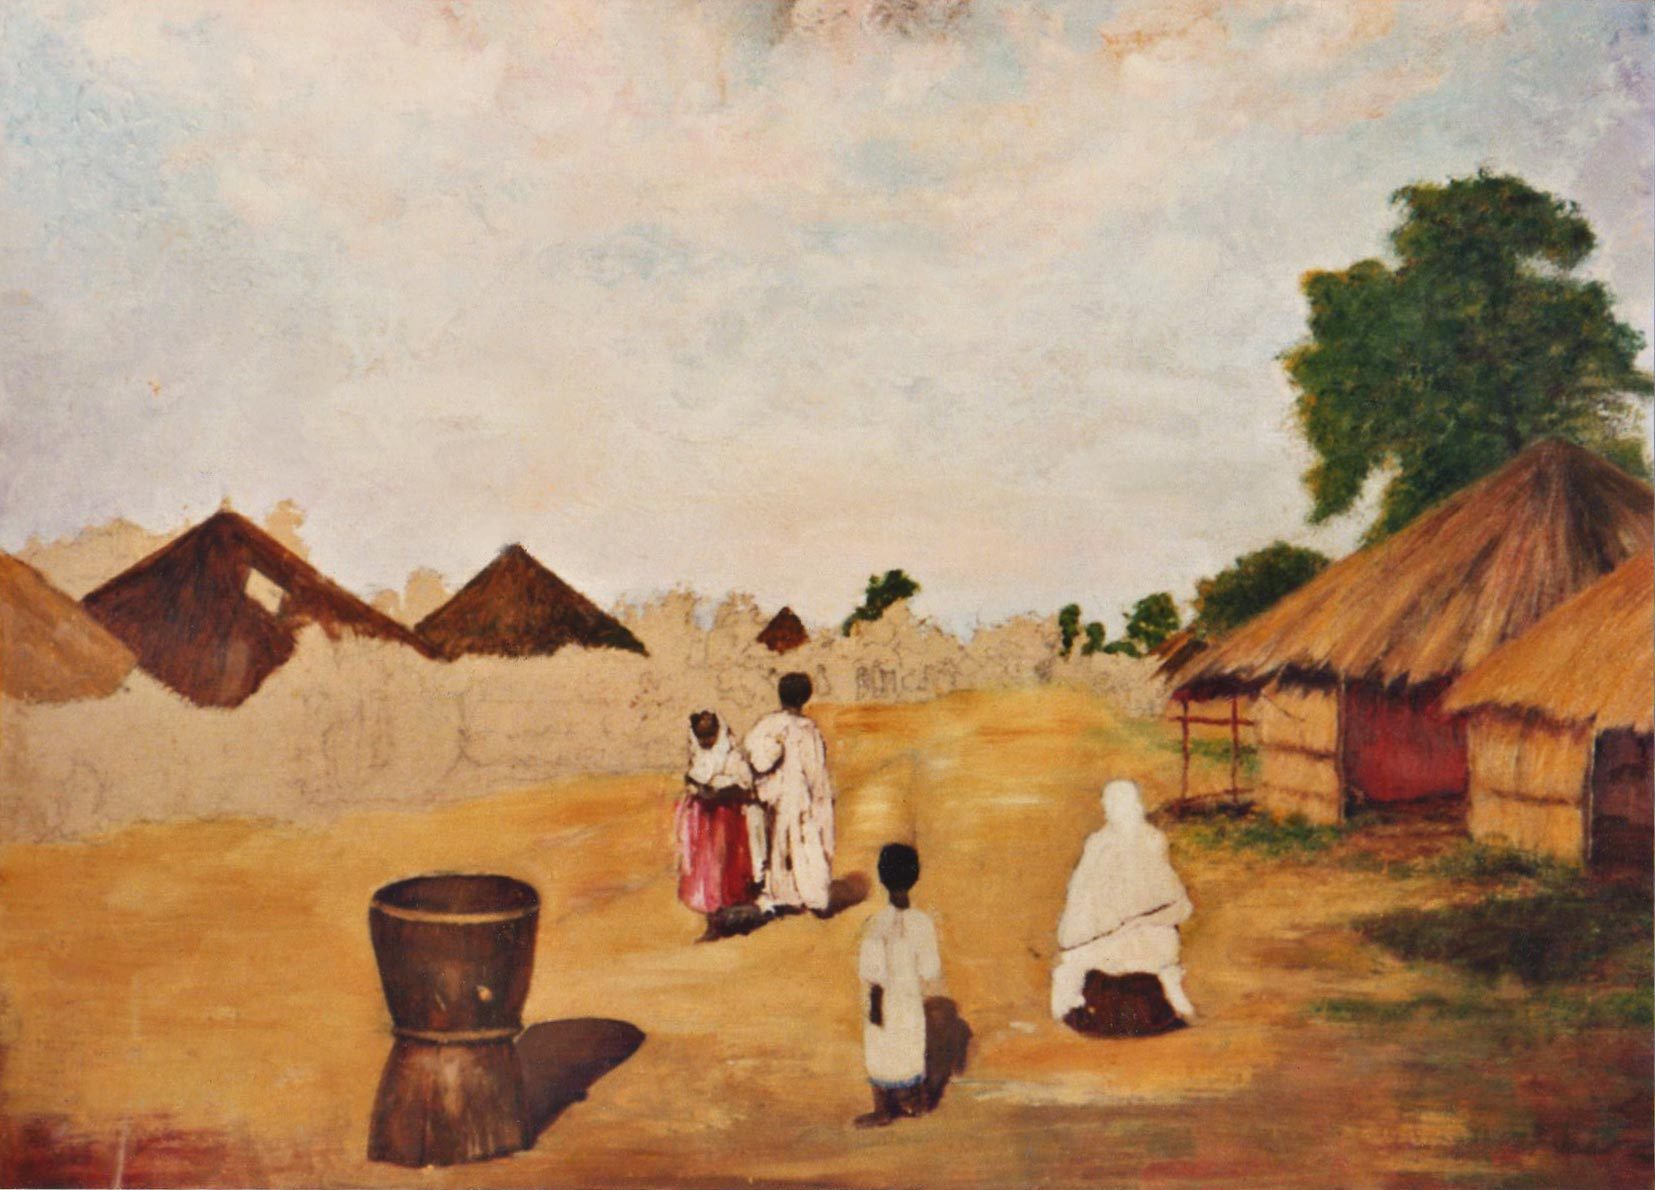 quadri africani villaggio paesaggio olio su tela Sabbatino